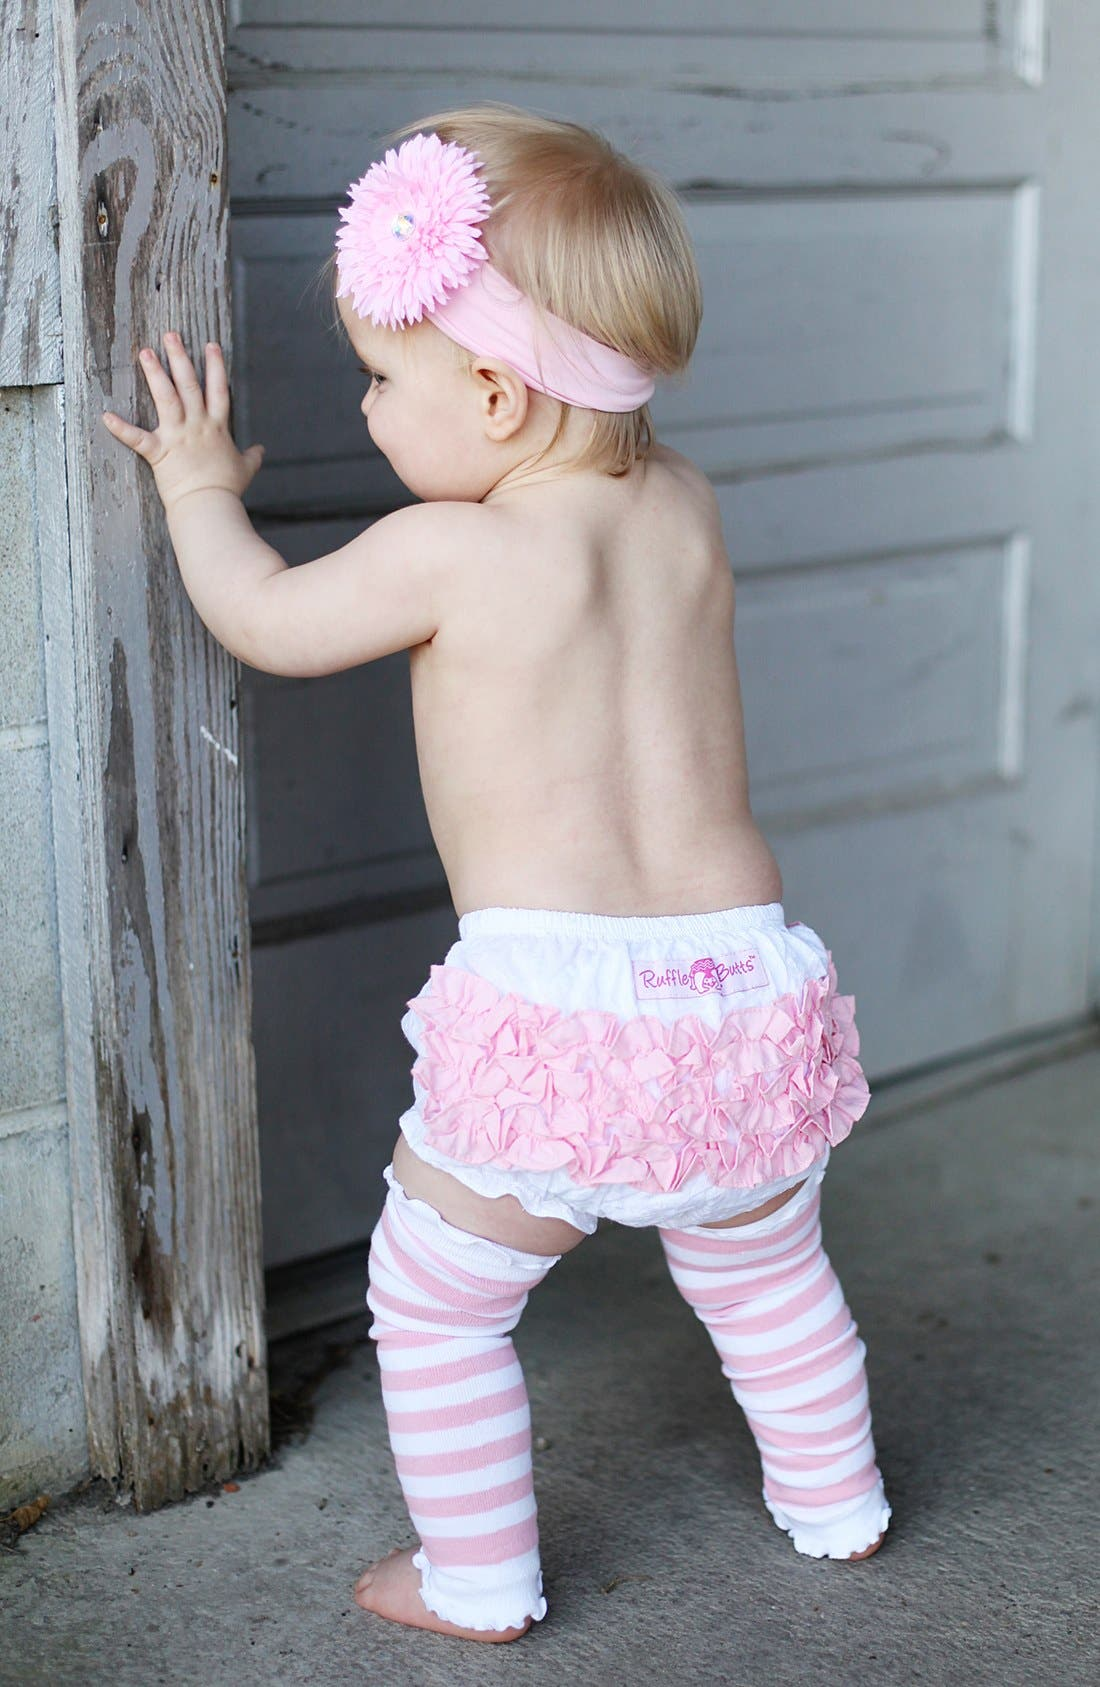 Alternate Image 2  - RuffleButts 'Pink & White' Headband, Bloomers & Leg Warmers (Baby)